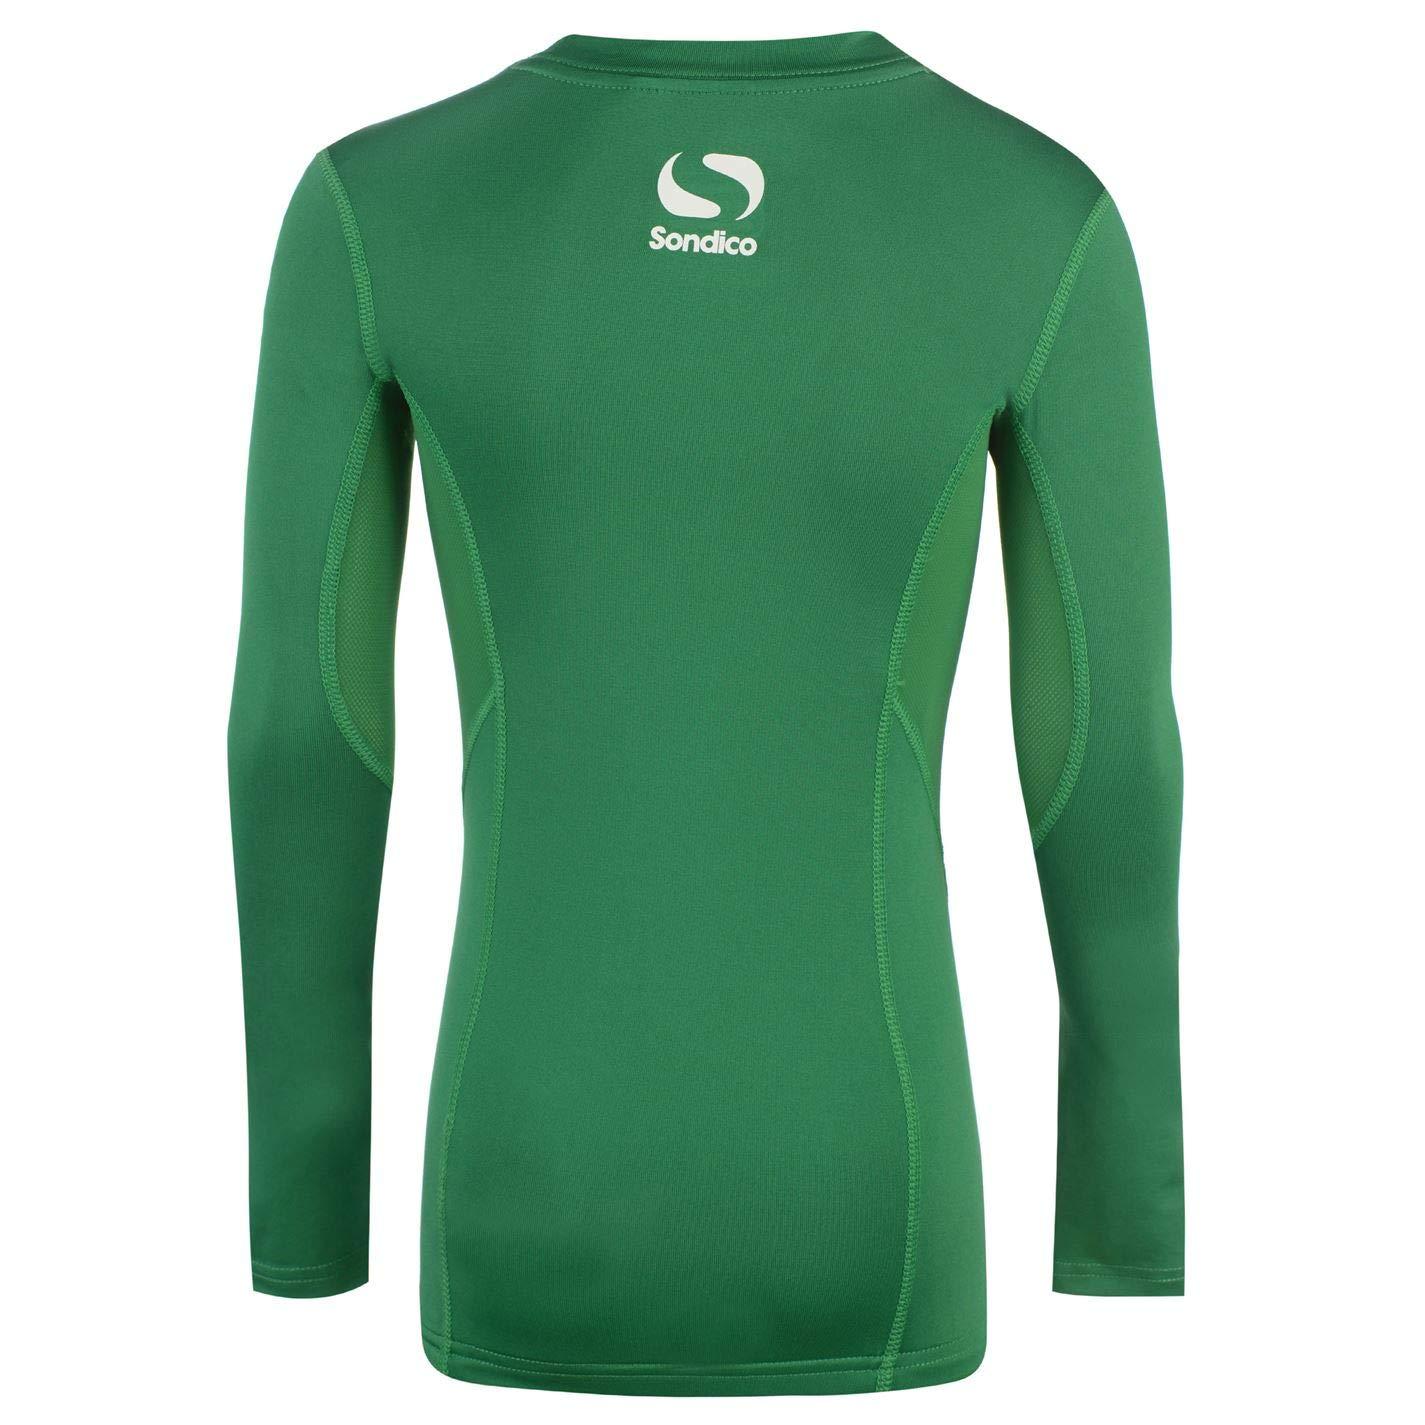 Sondico Kids Boys Long Sleeved Core Base Layer Junior Baselayer Top Compression Green 9-10 Yrs